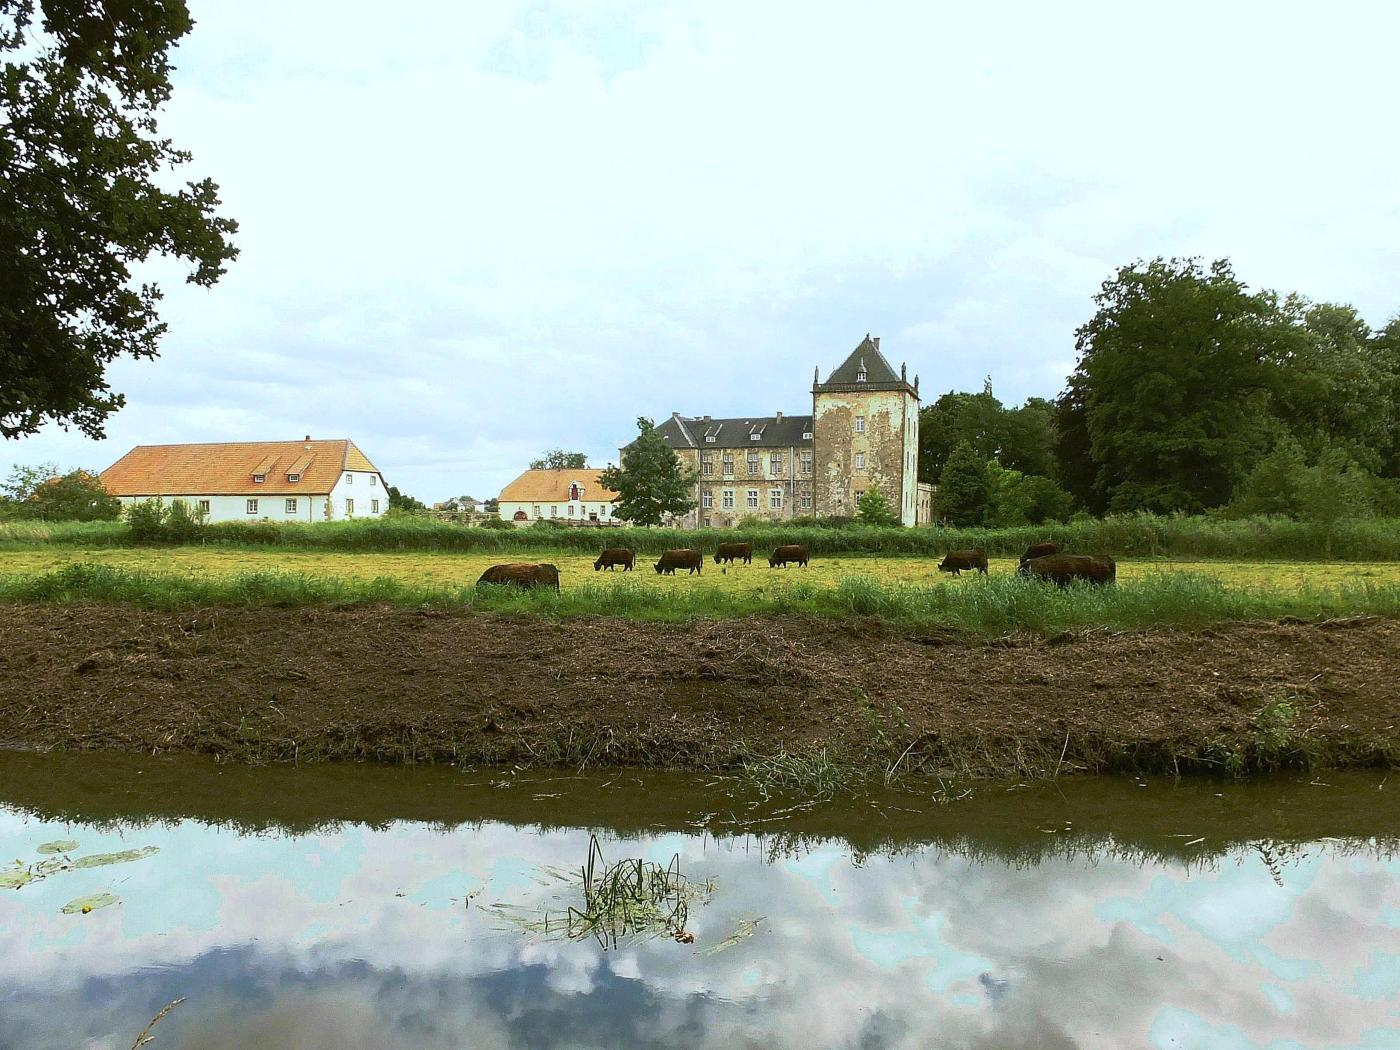 Else und Schloss Gesmold